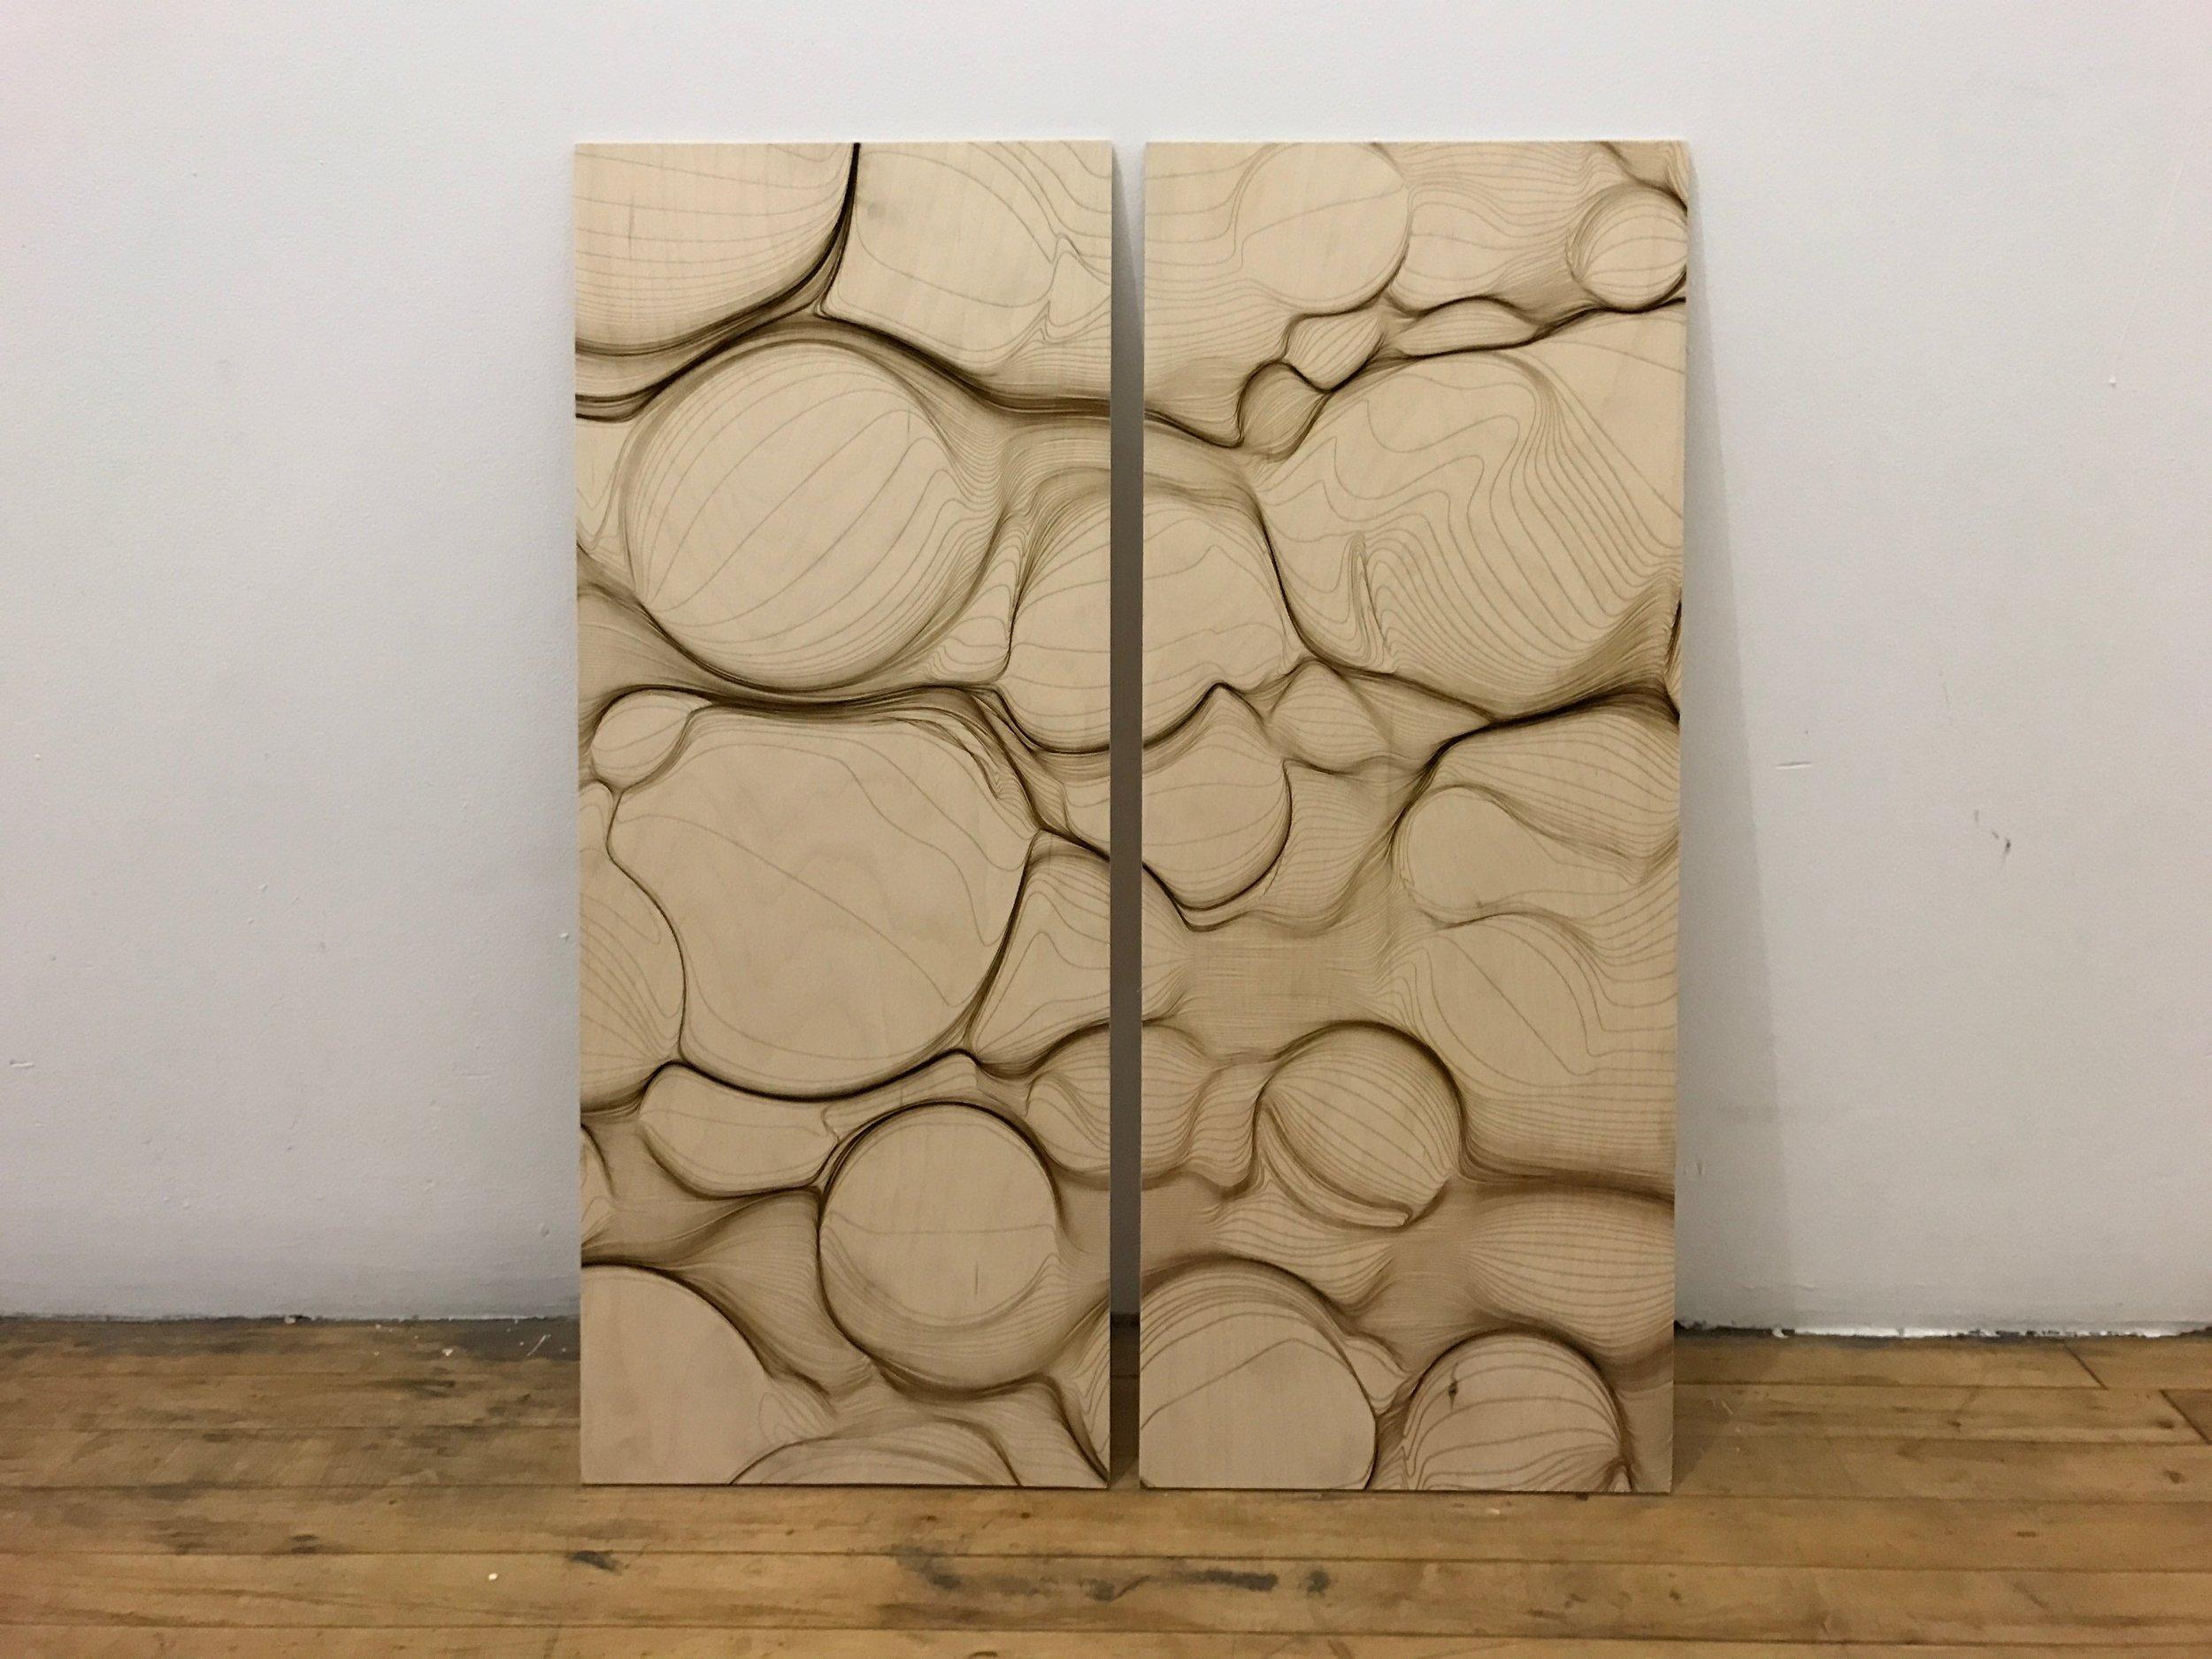 Etched Baltic Birch Plywood by Marius Watz